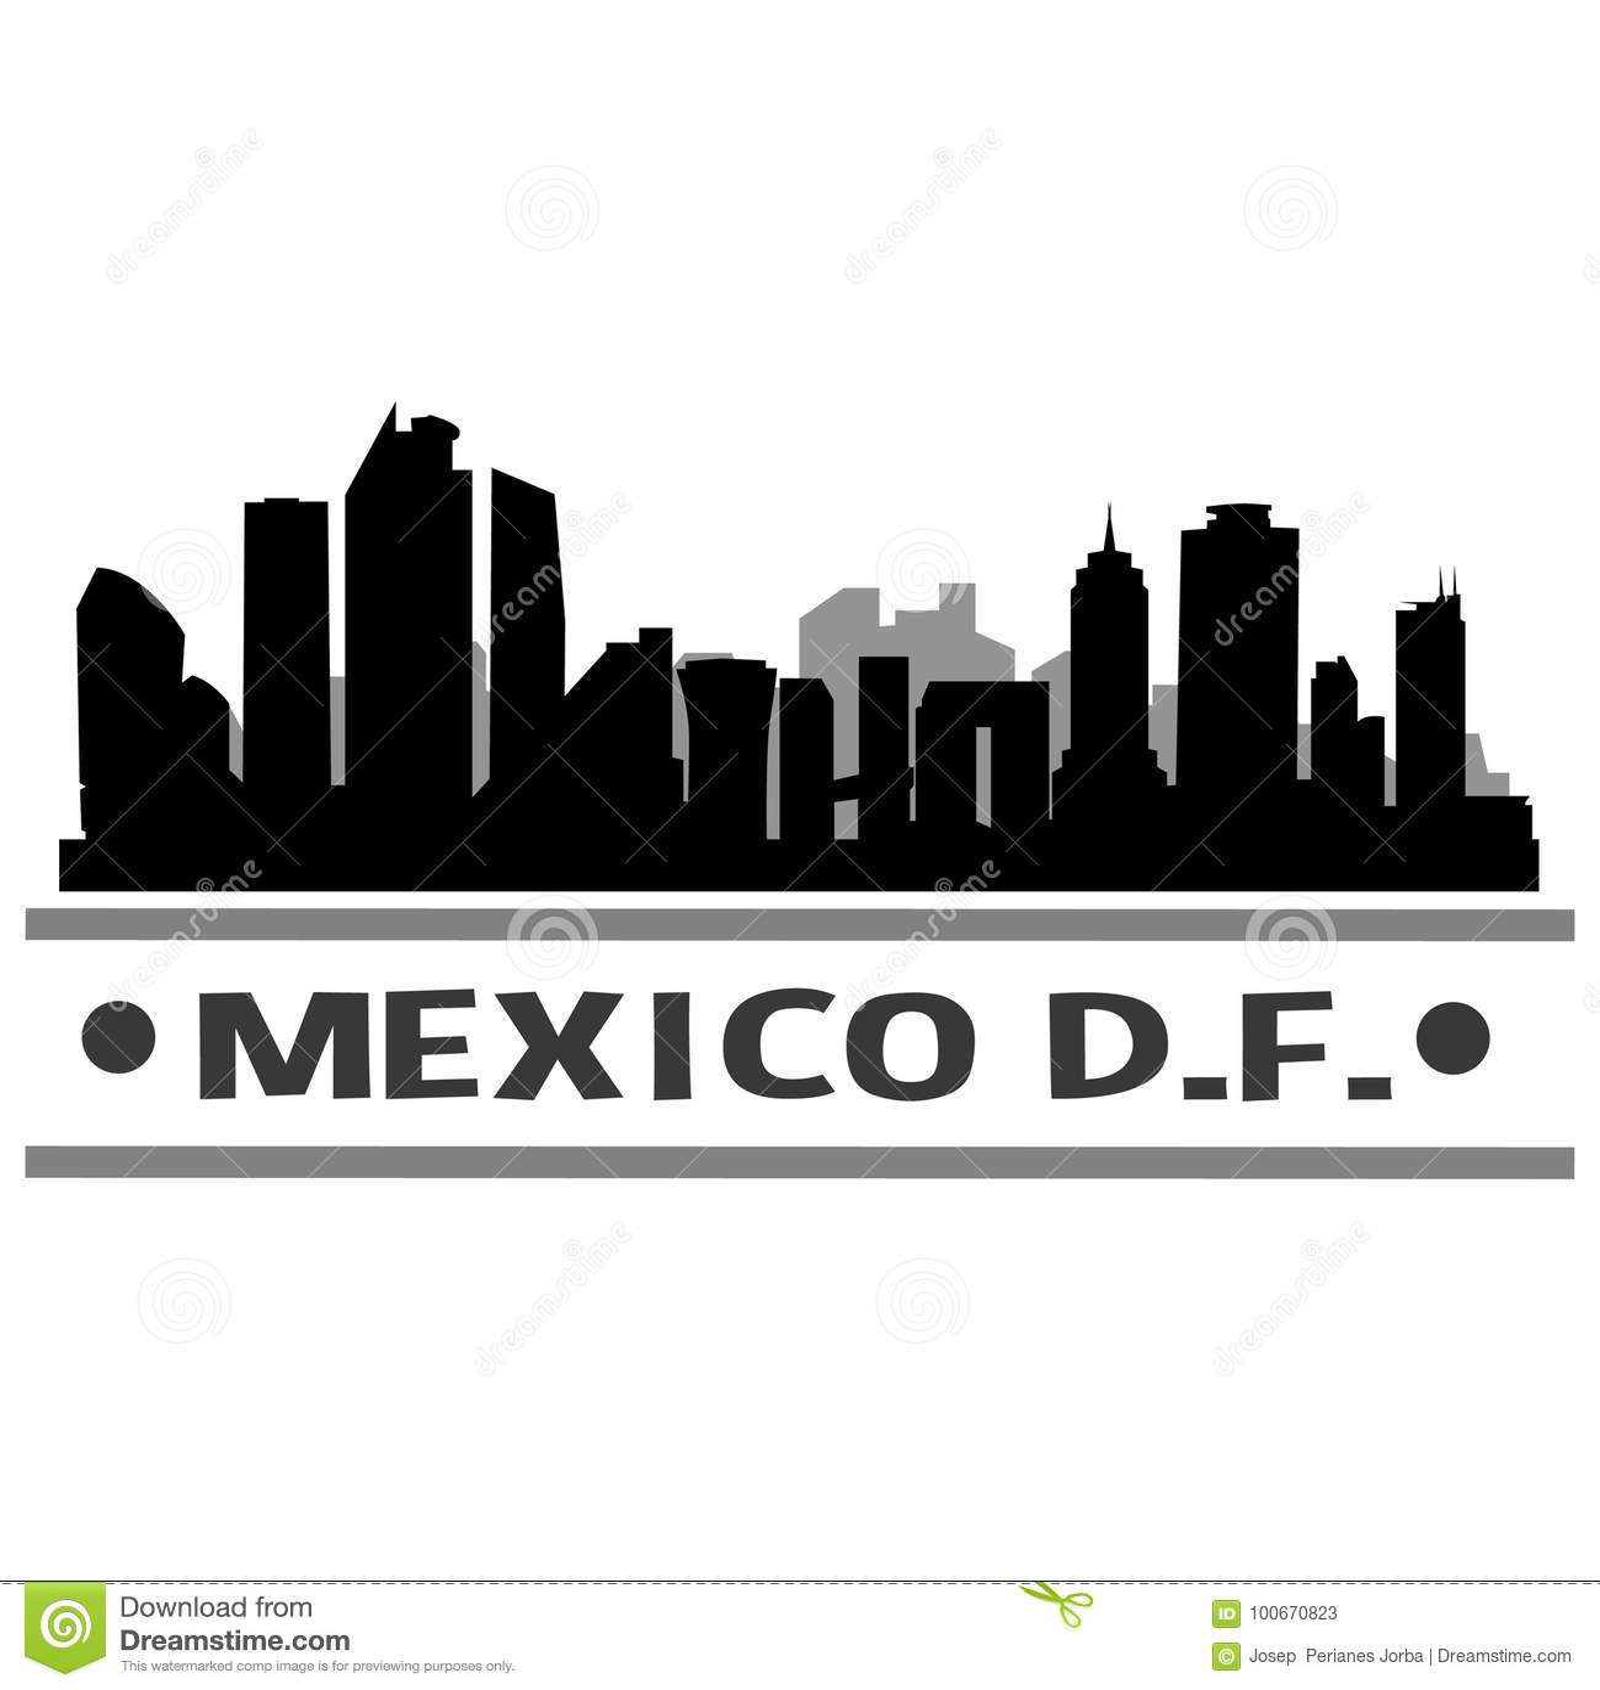 Mexico DF Skyline City Icon Vector Art Design